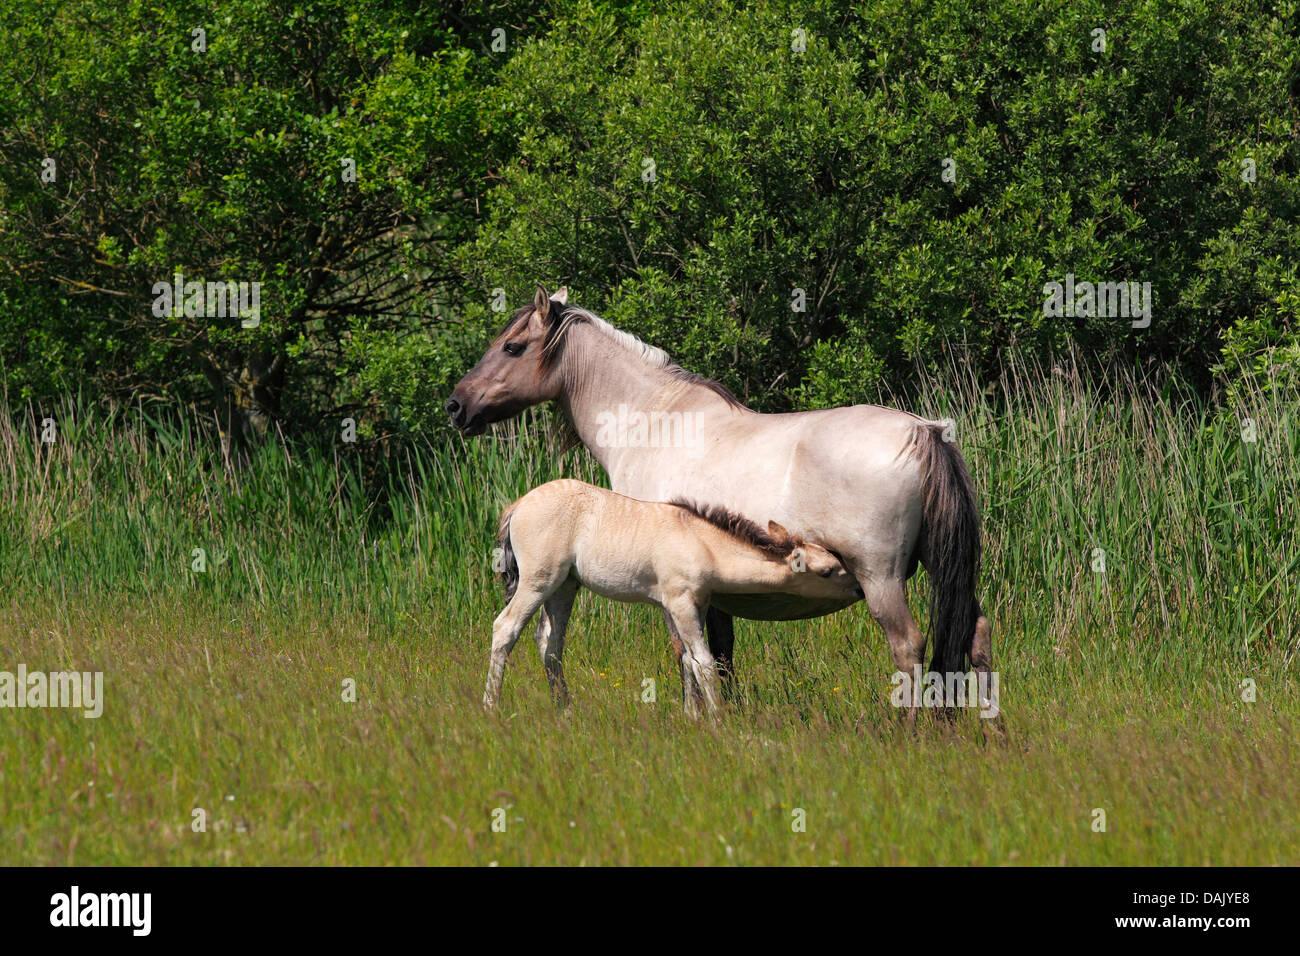 Mare suckling foal, Konik horse or Polish Primitive Horse, Tarpan breeding back (Equus przewalskii f caballus) - Stock Image